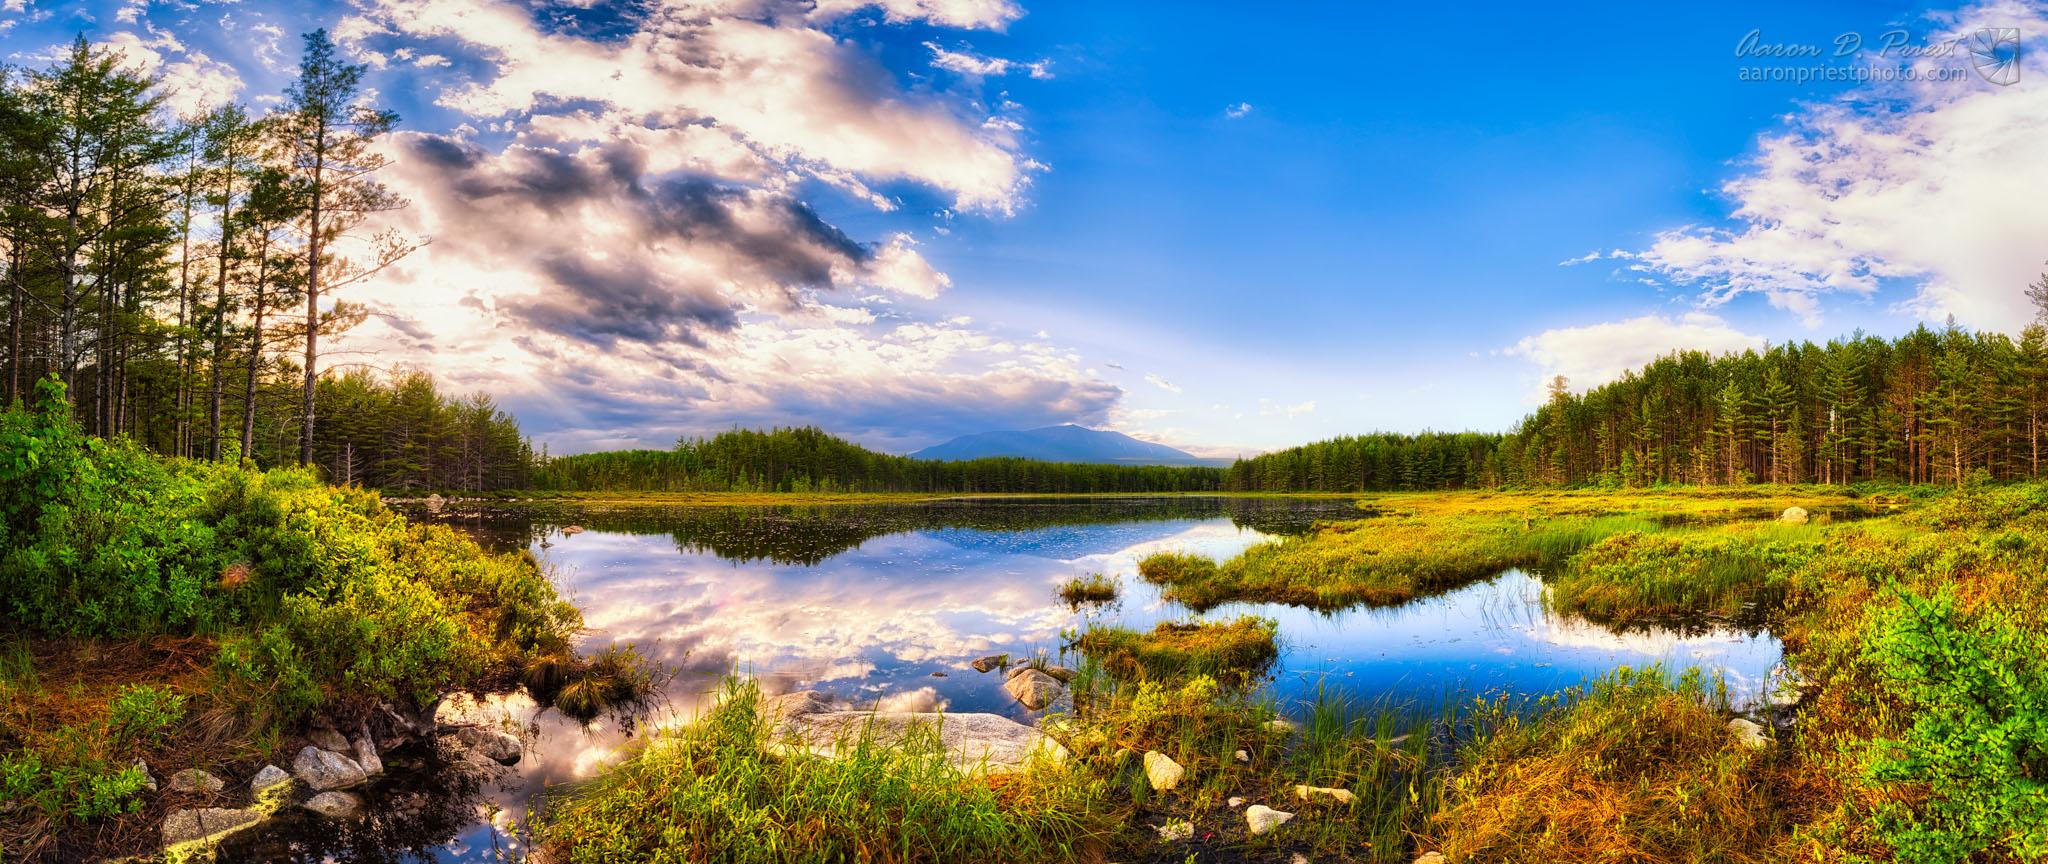 Mt. Katahdin reflecting in Sunday Pond